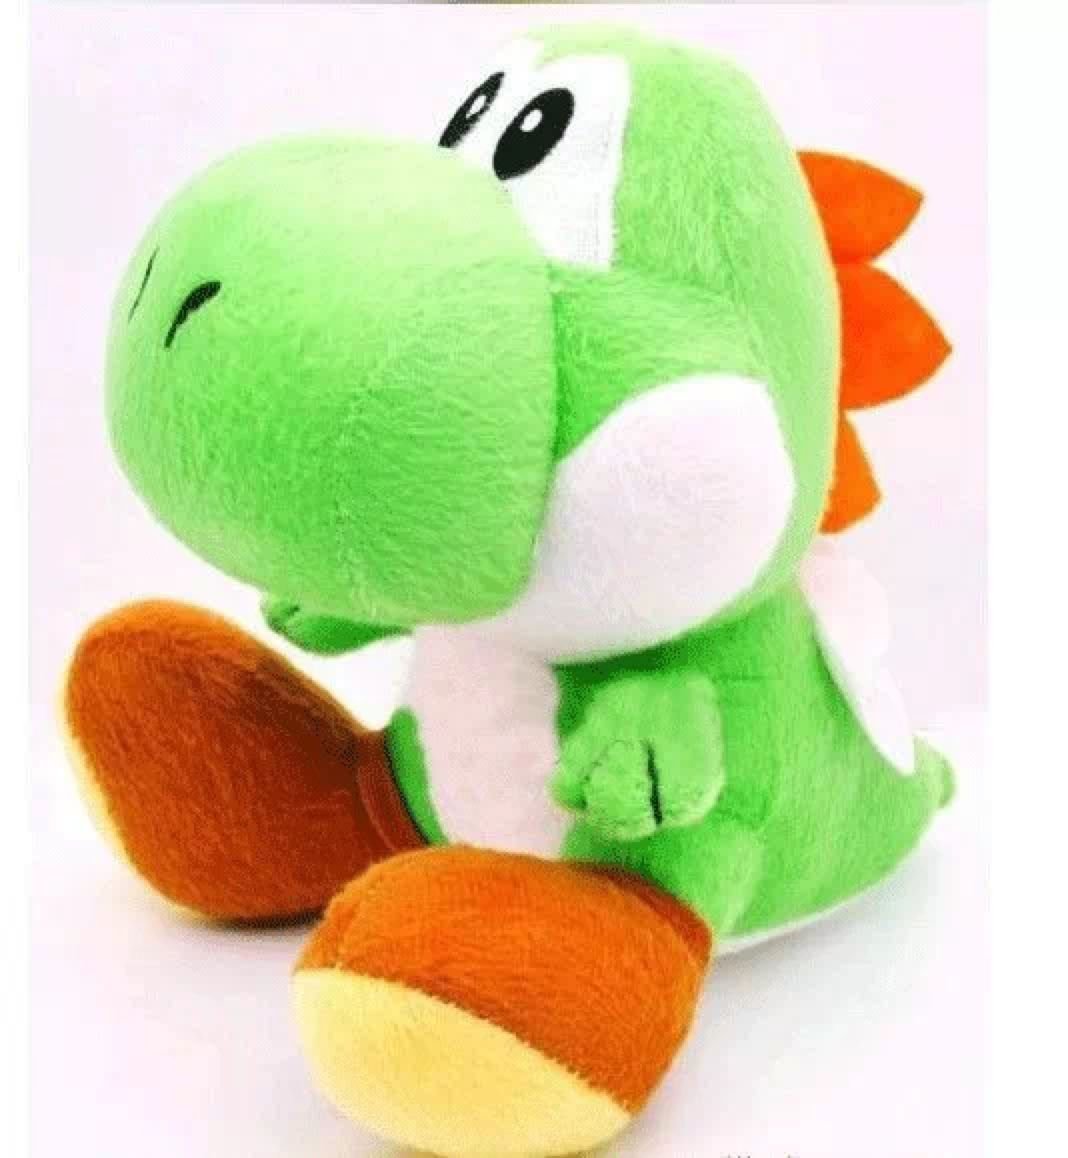 Doll toys images  Nintendo Super Mario Brothers Bros Green Yoshi